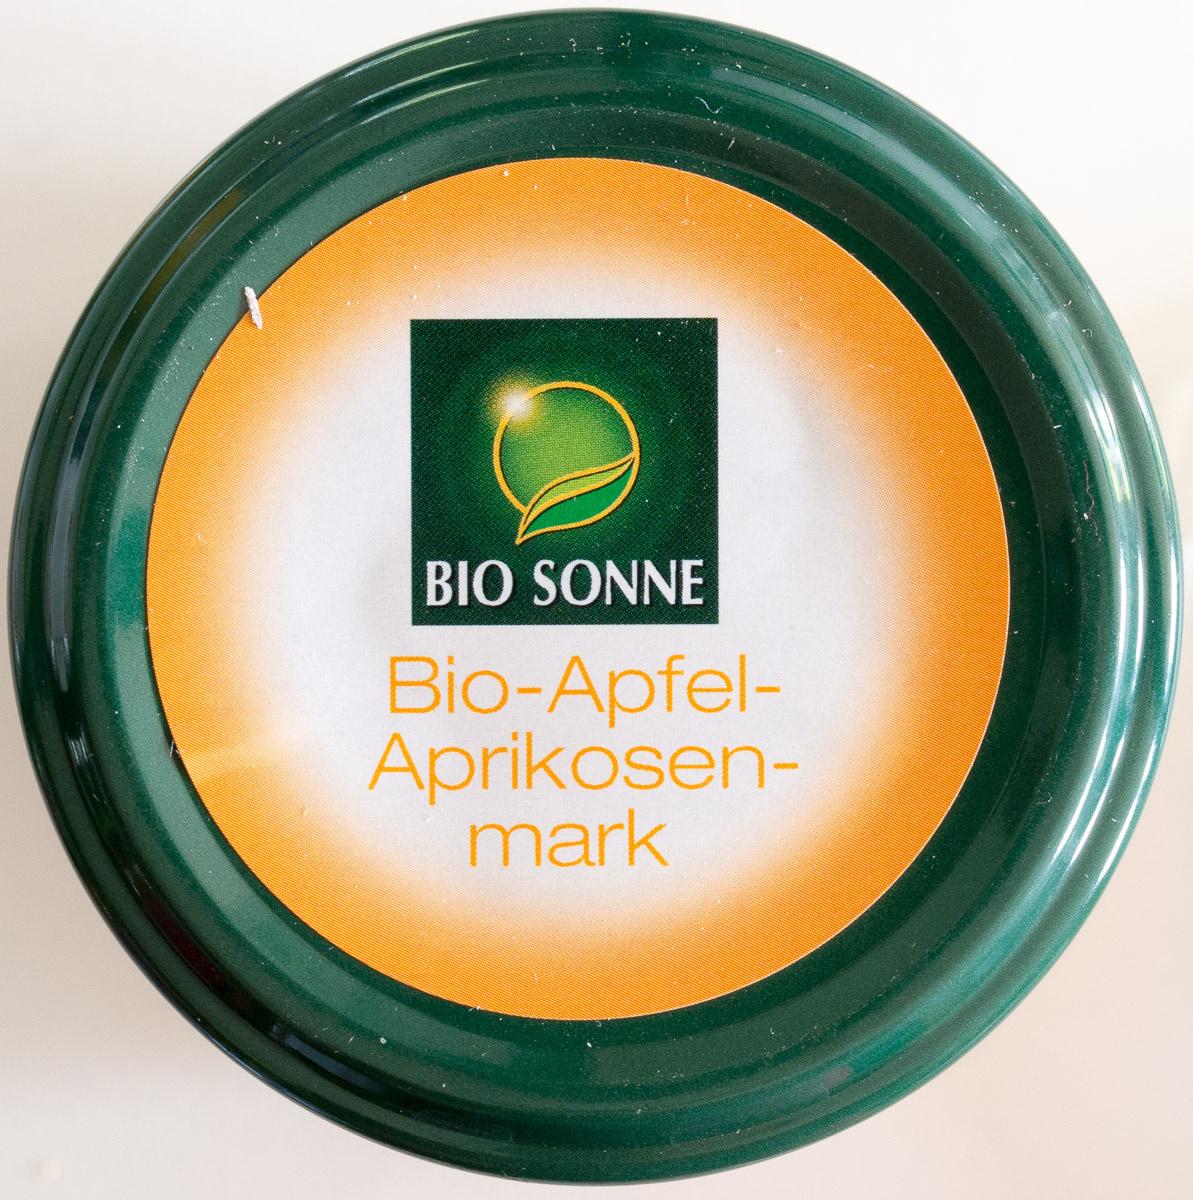 Bio-Apfel-Aprikosenmark - Product